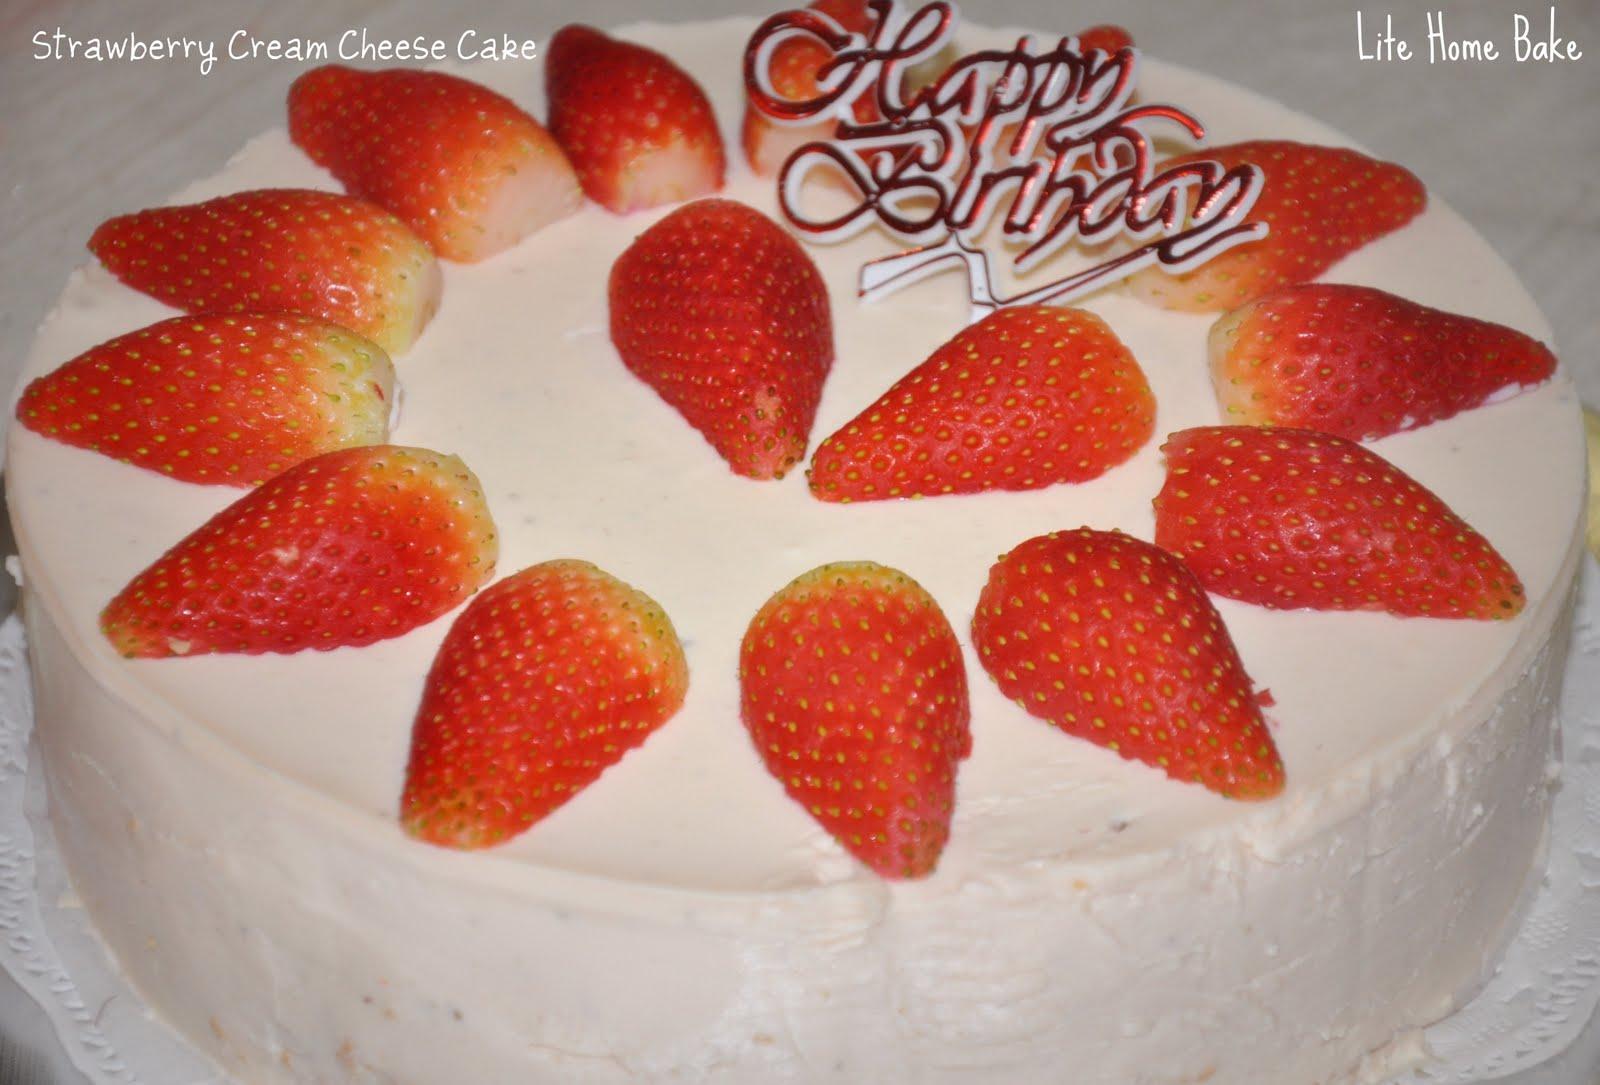 Happy Birthday Happy Valentines Day Sweetheart Lite Home Bake